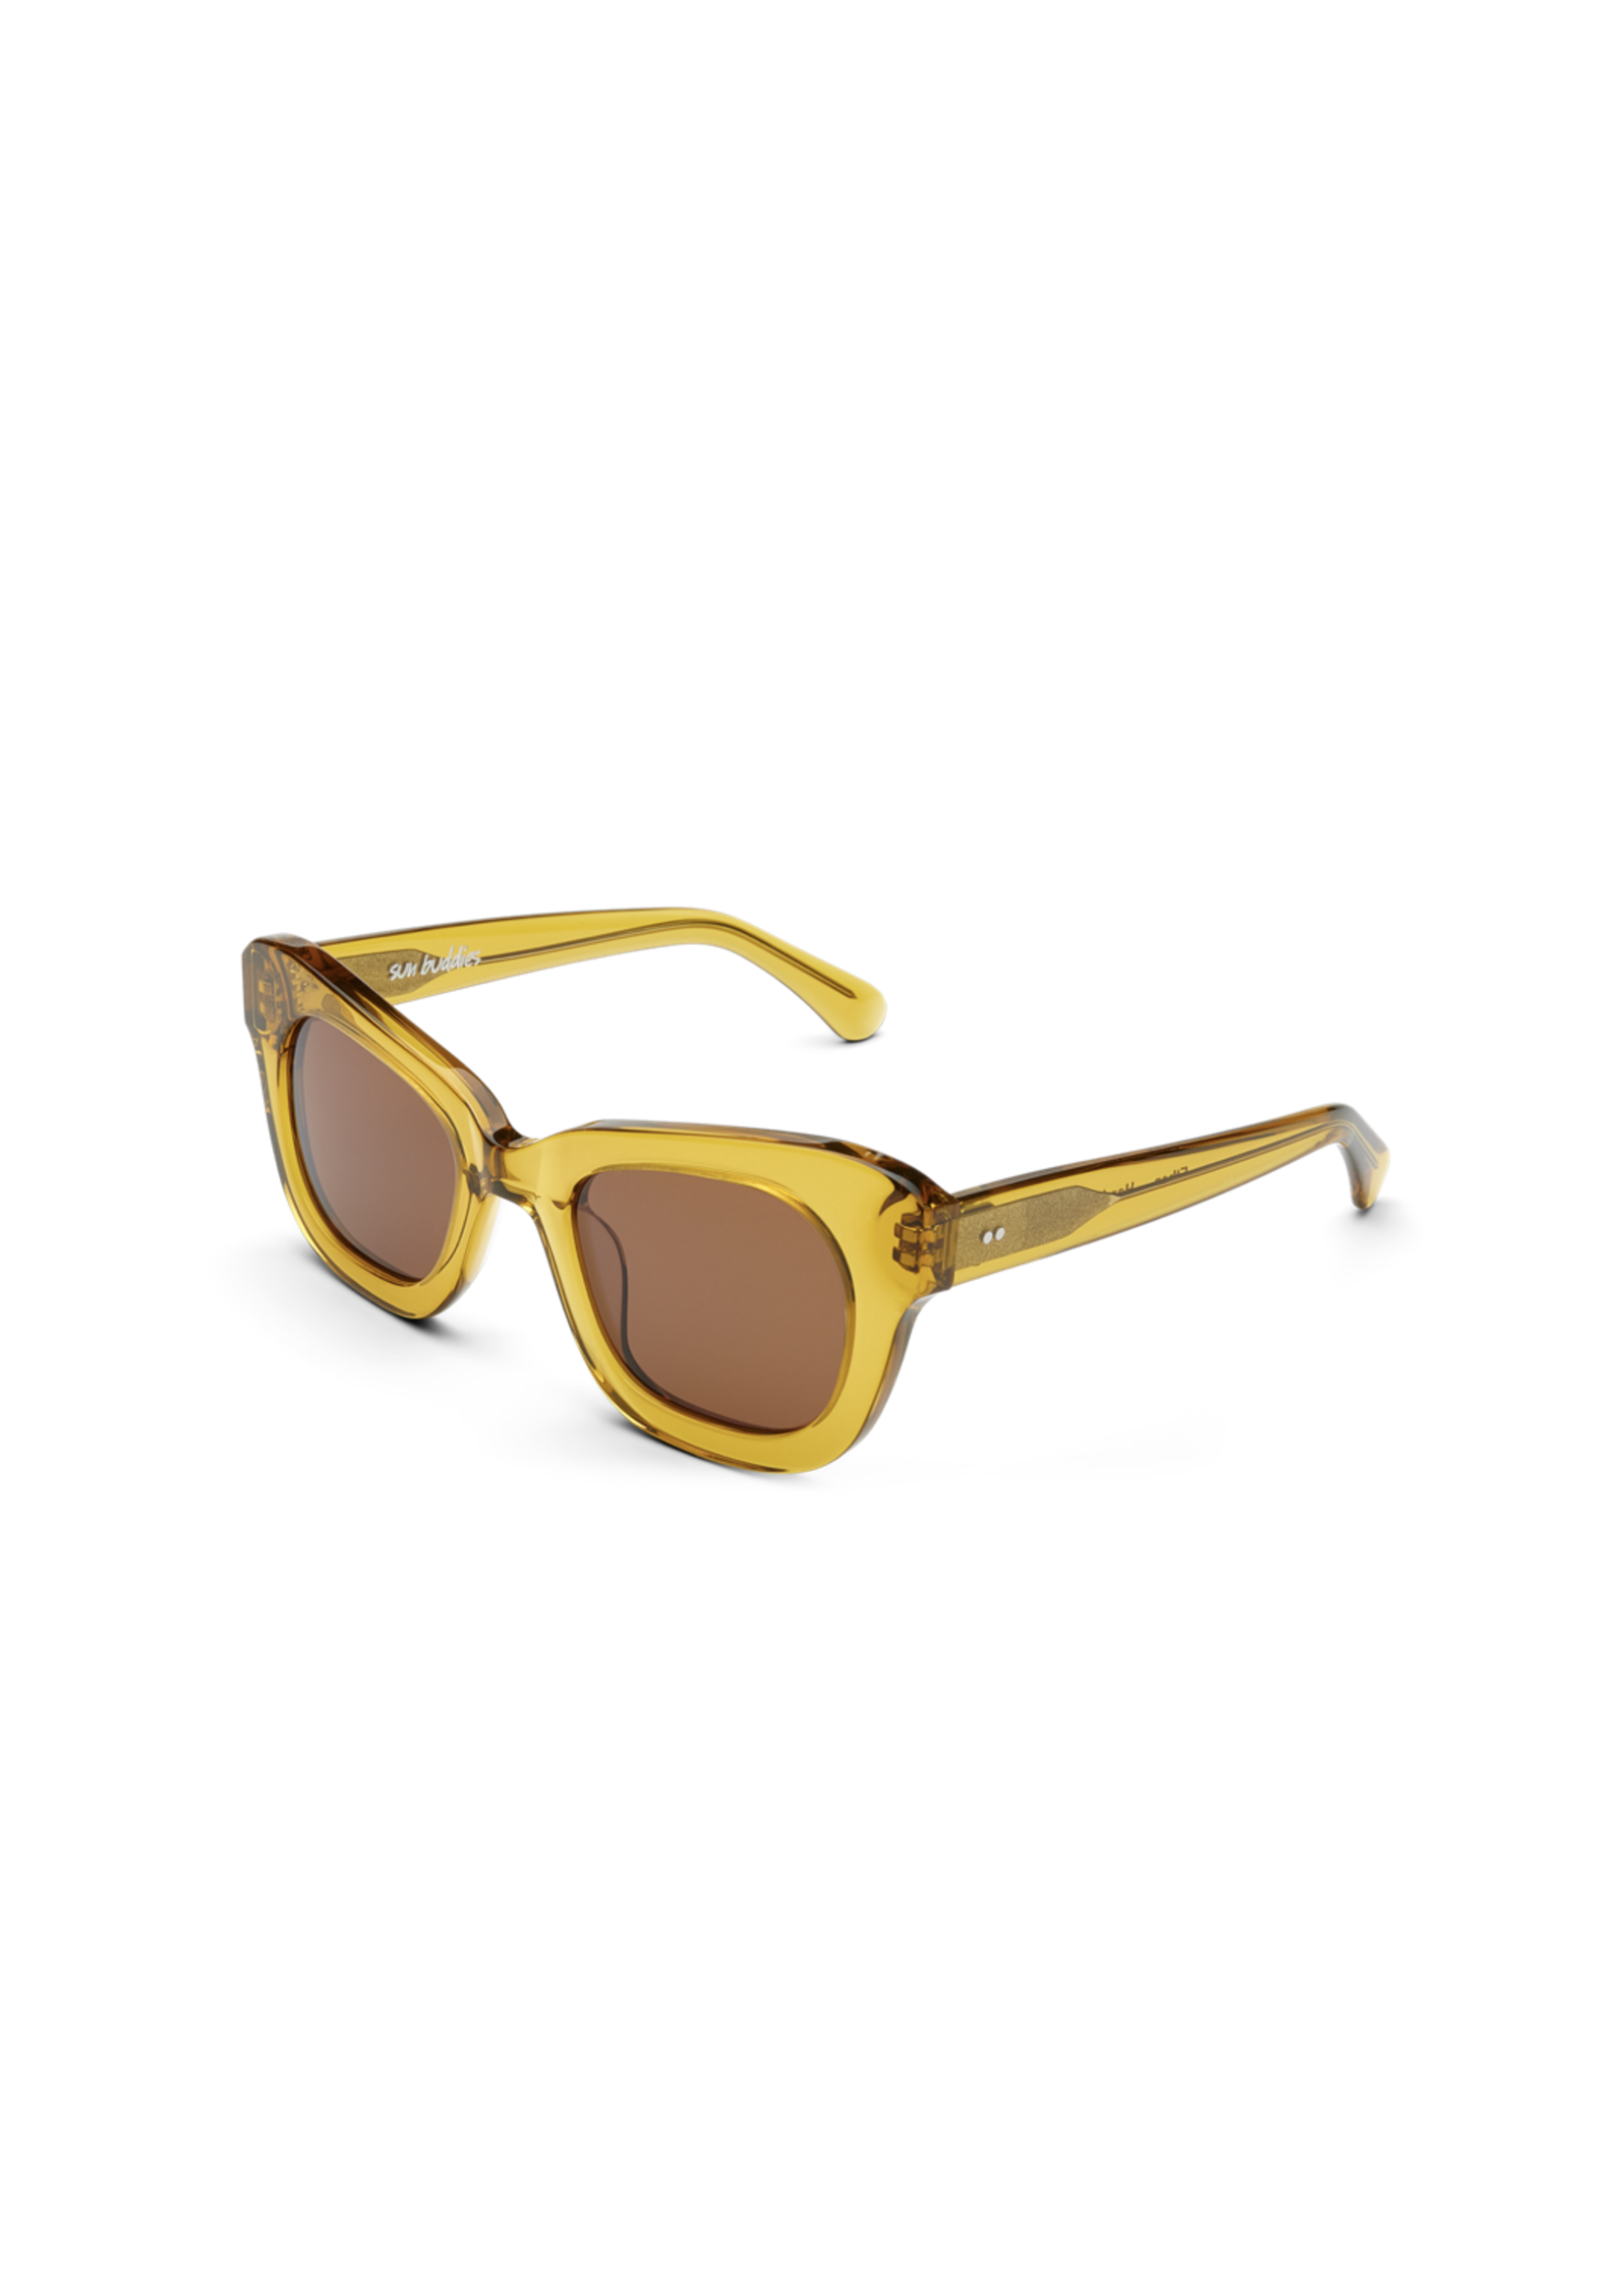 Sun Buddies Ethan Sunglasses in Honey Mustard